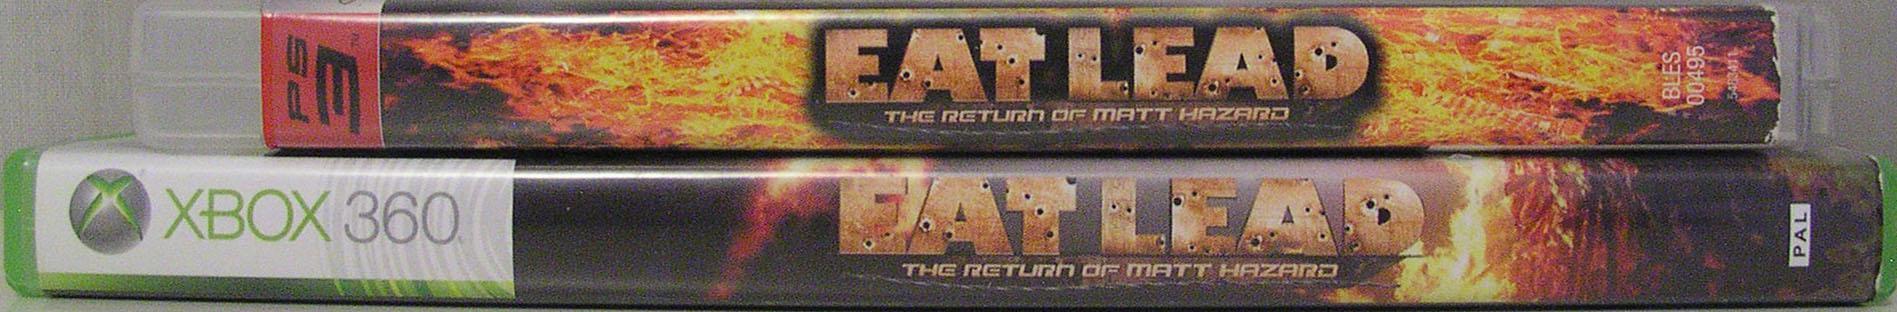 Double Jeu #34 Eat Lead : Return of Matt Hazard